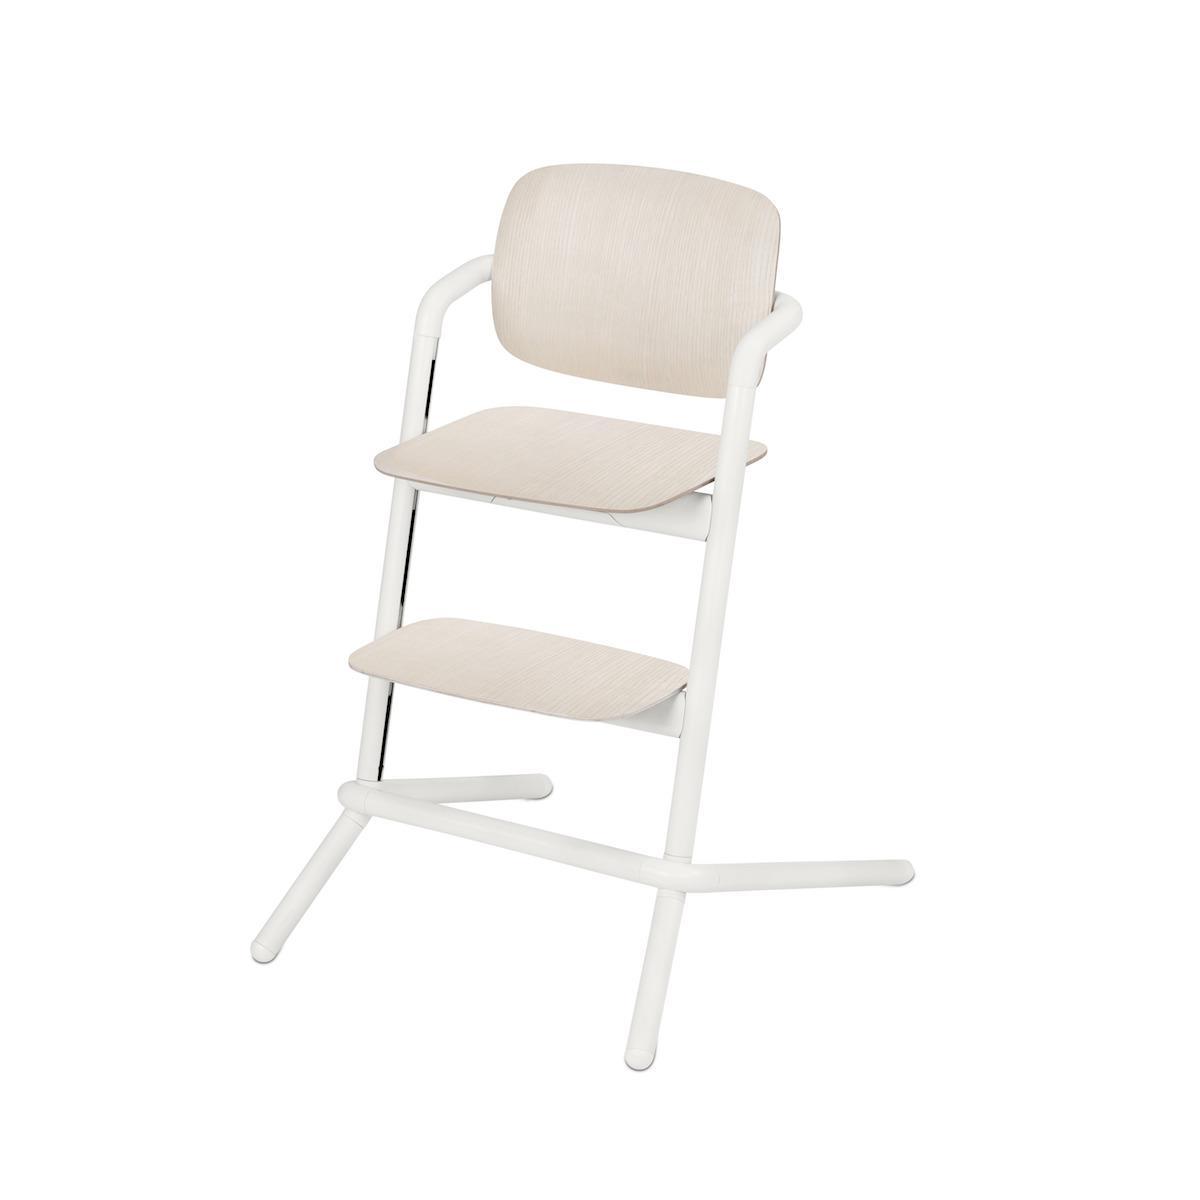 Chaise haute bois LEMO Cybex porcelaine white-white